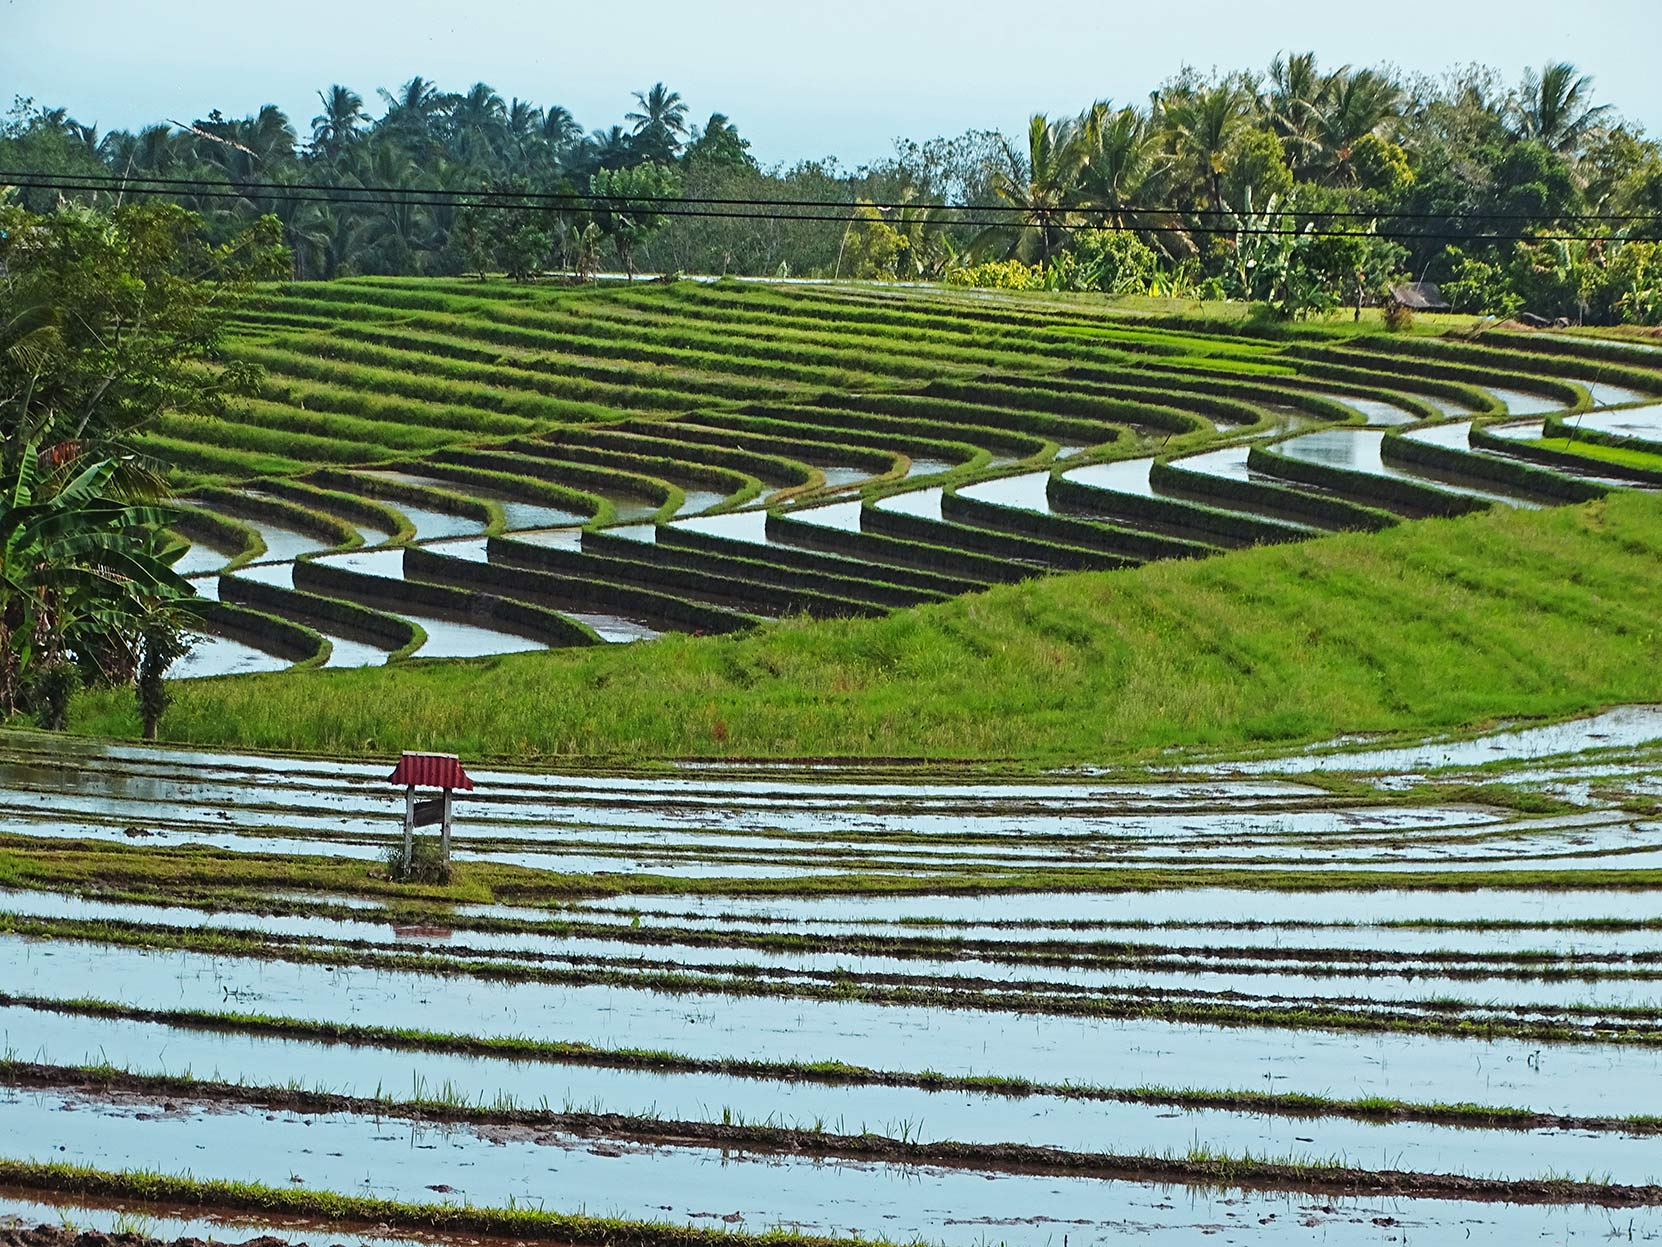 BALI Rondreis Bali, de kleine Sunda eilanden en Lombok